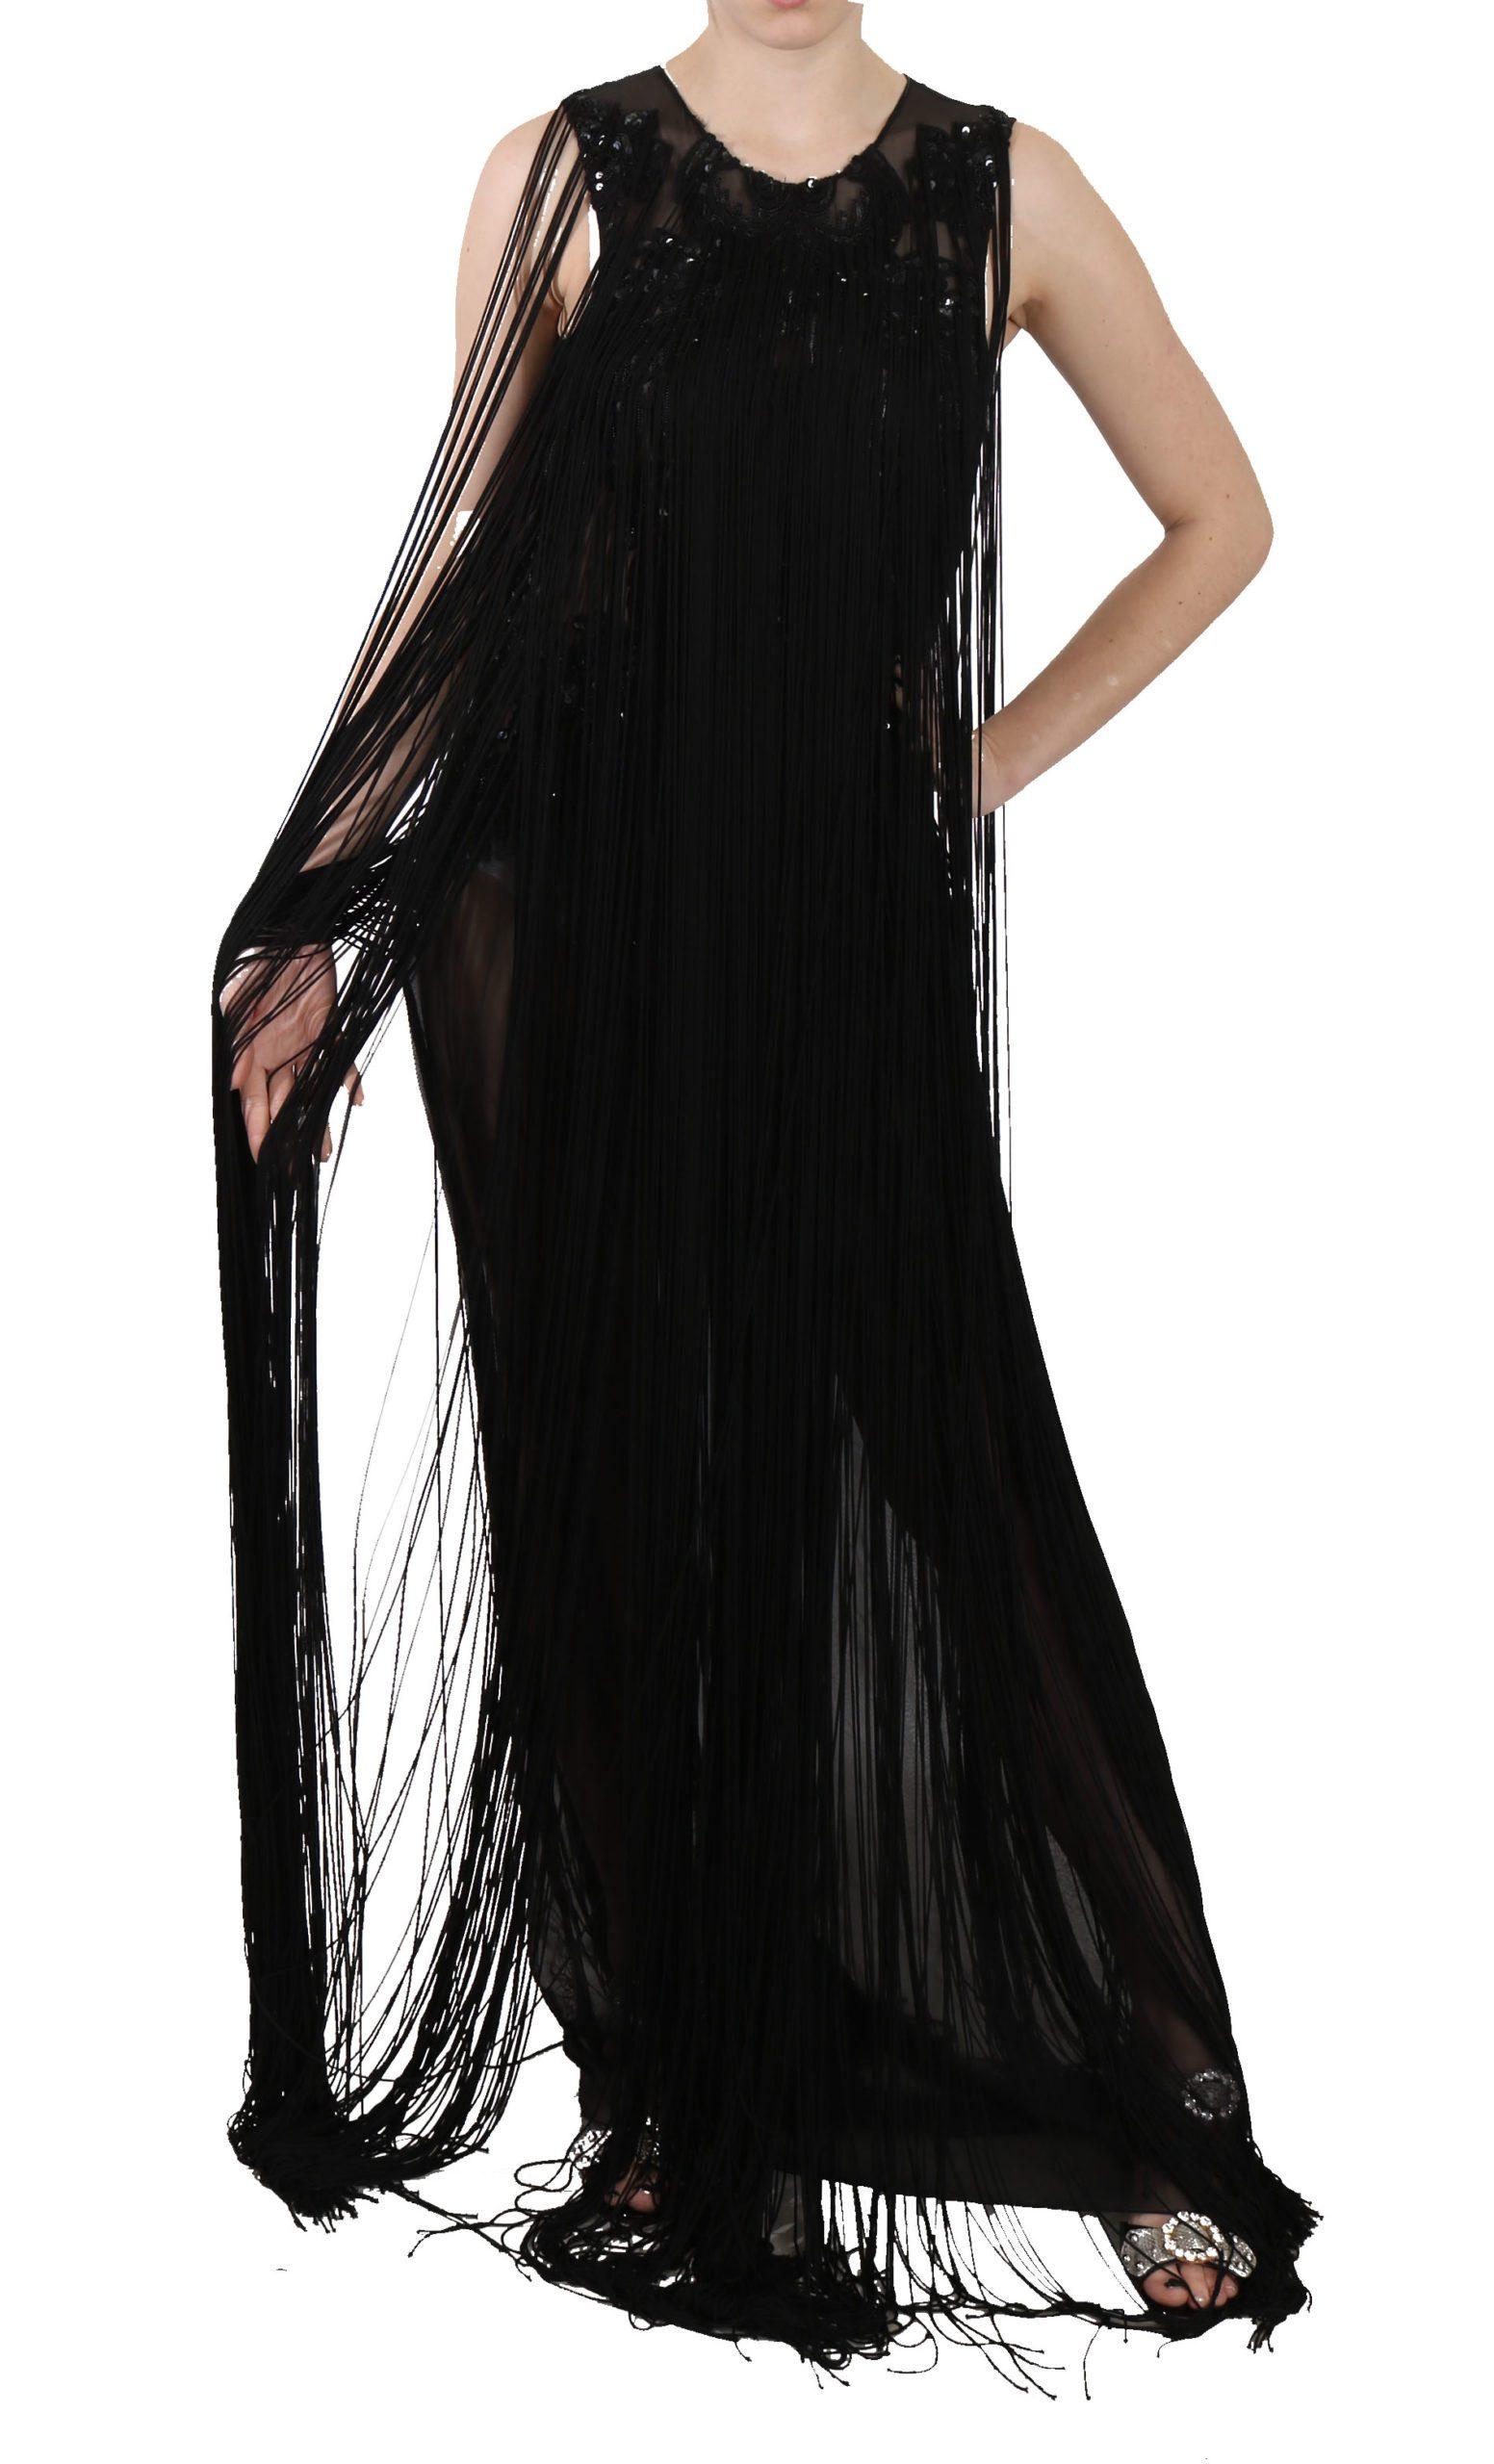 John Richmond Women's Silk Beaded Sequined Sheer Dress Black DR1682 - IT42|M